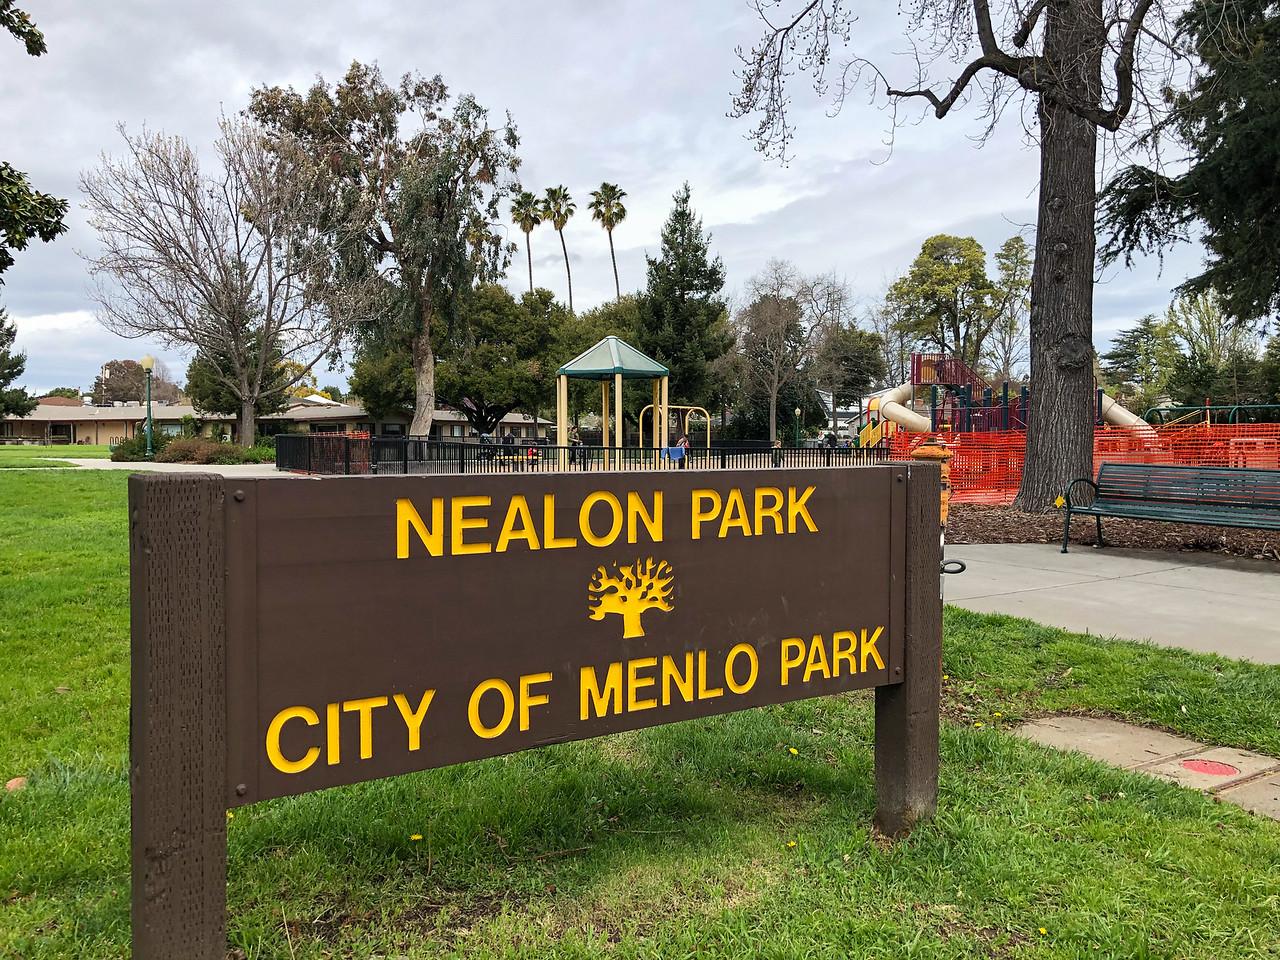 Nealonn+Park+Menlo+Park+Blu+Skye+Media--2-X2.jpg